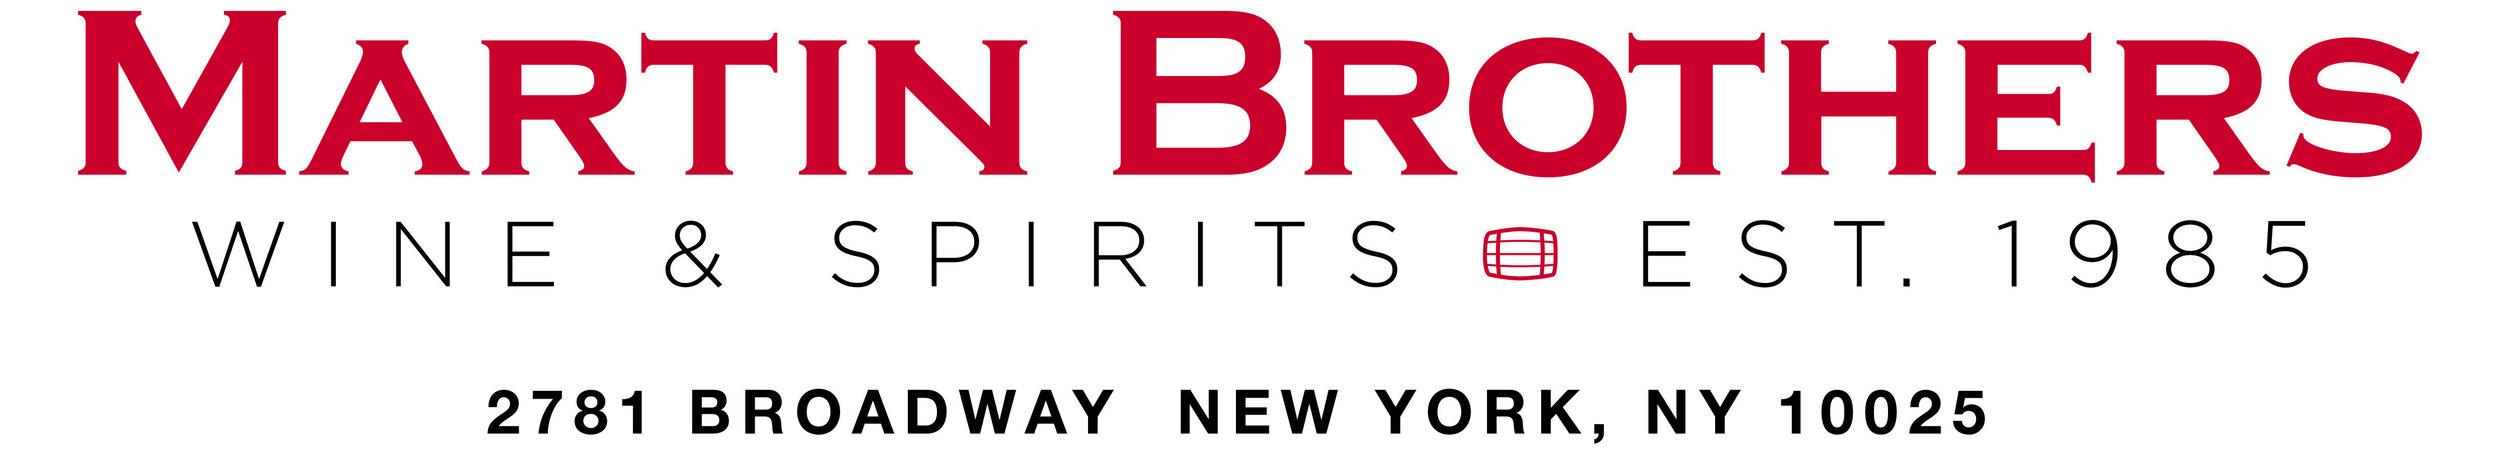 mbws_-new-logo-2014.jpg